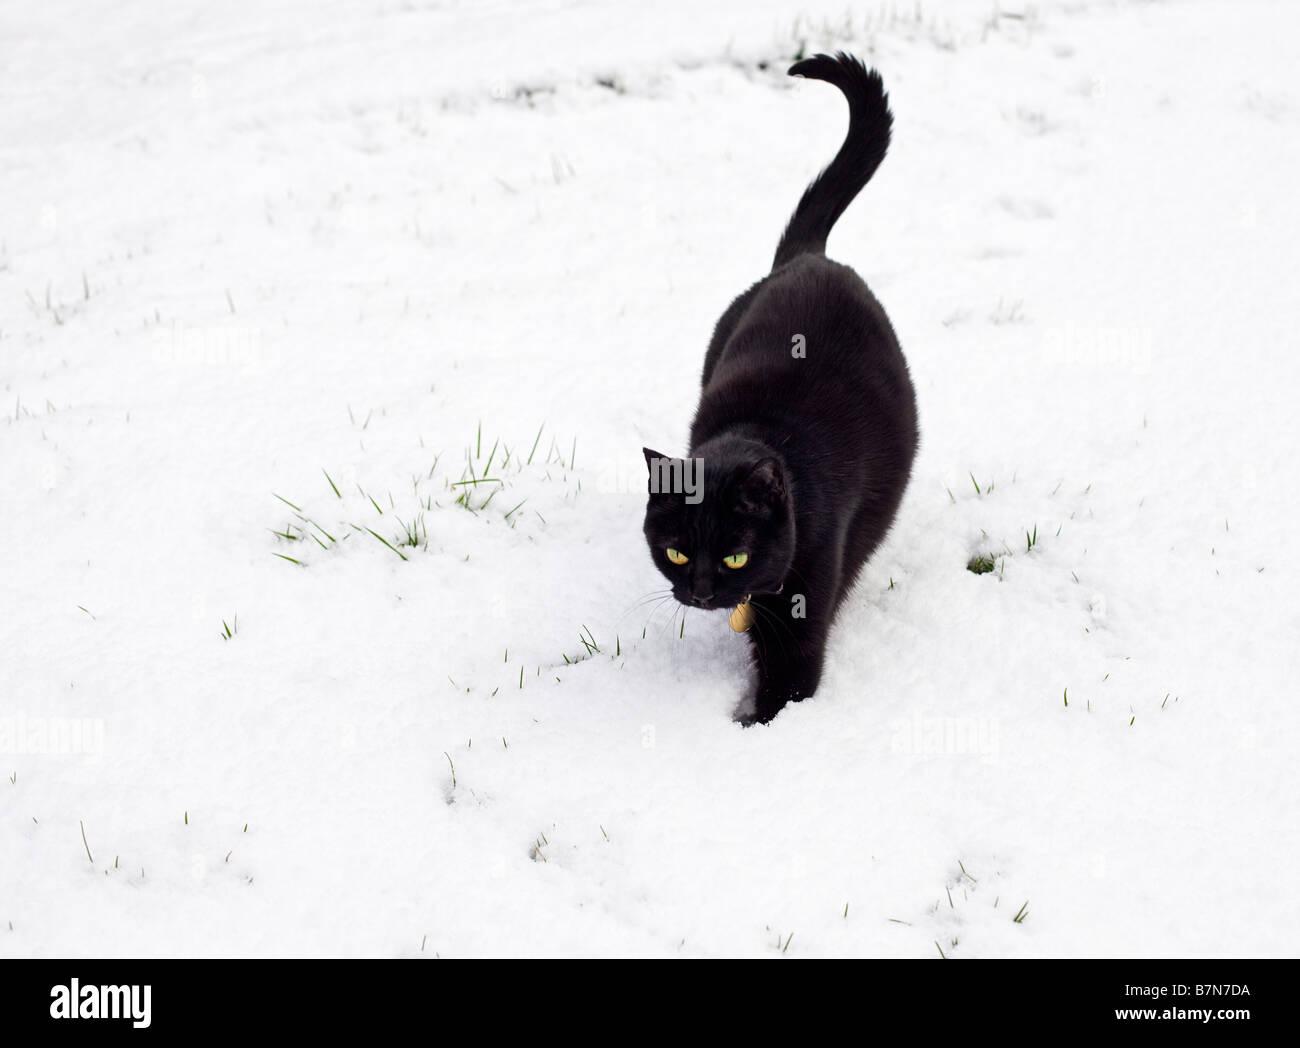 Black cat walking outdoors in deep winter snow PR - Stock Image